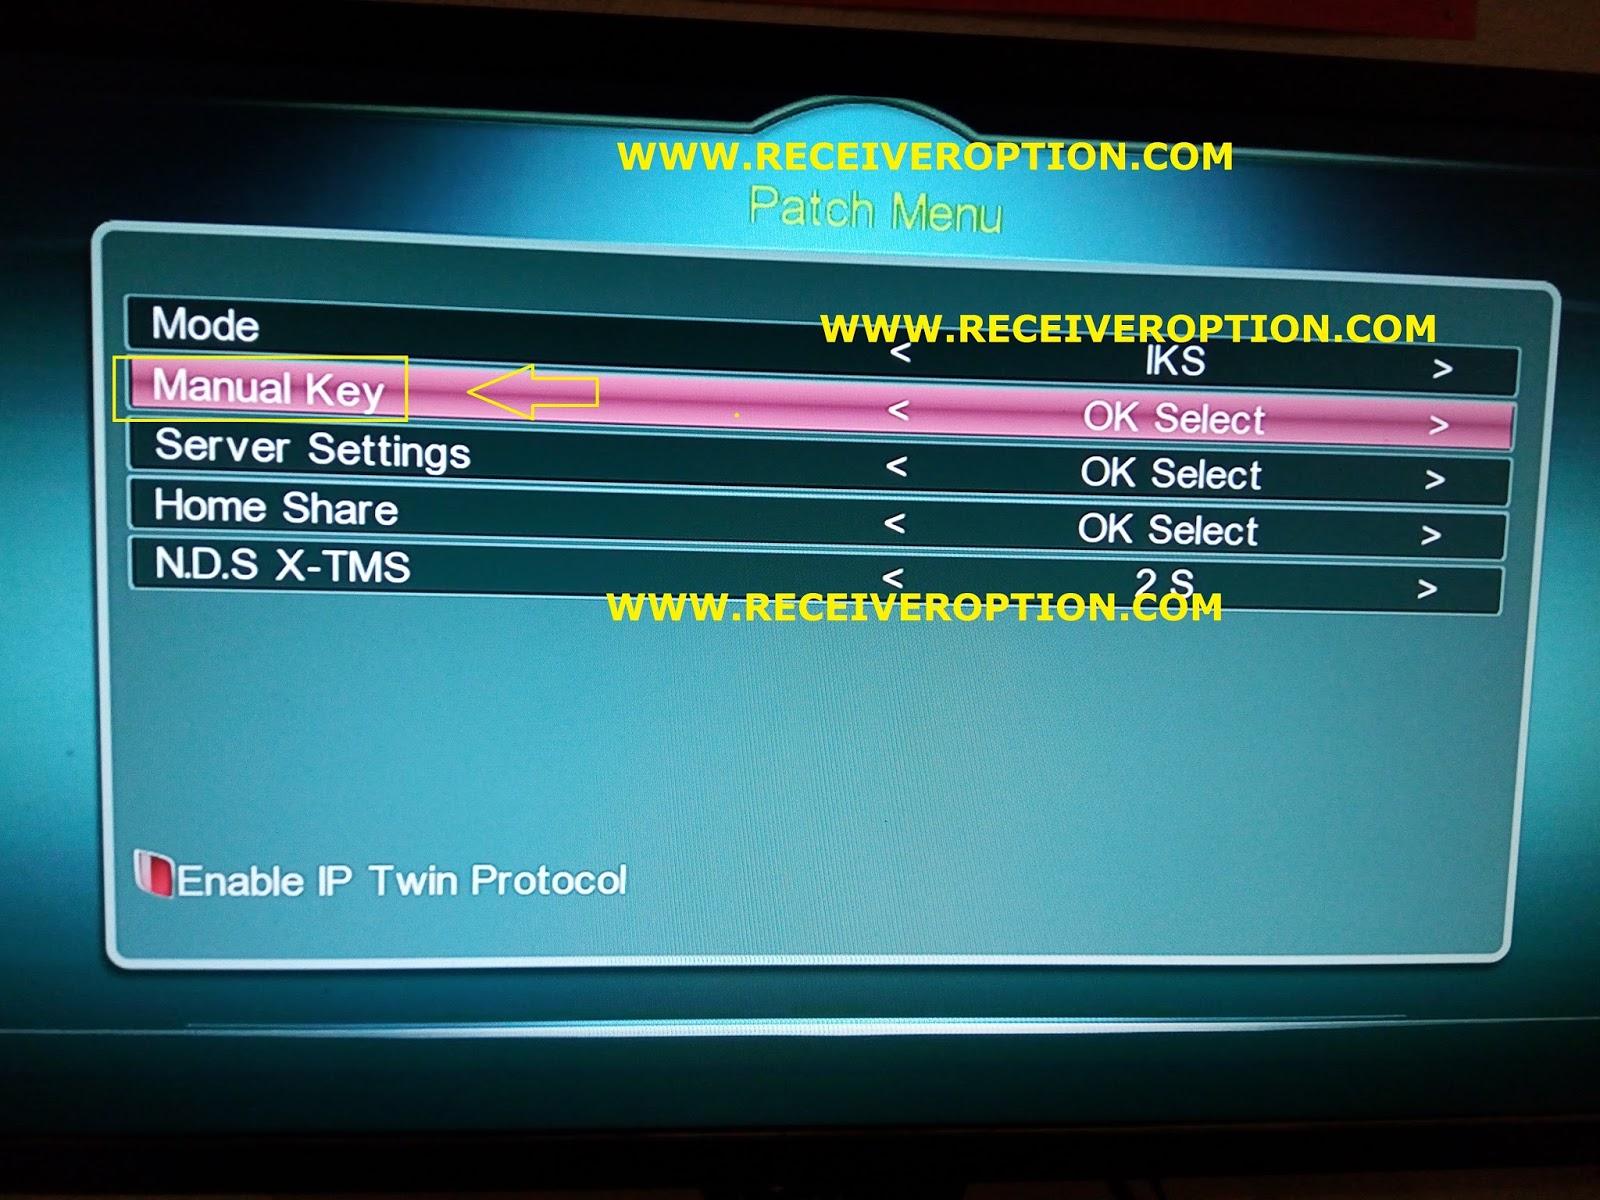 SUPER MAX SM 3000 HD 3G RECEIVER POWERVU KEY OPTION - HOW TO